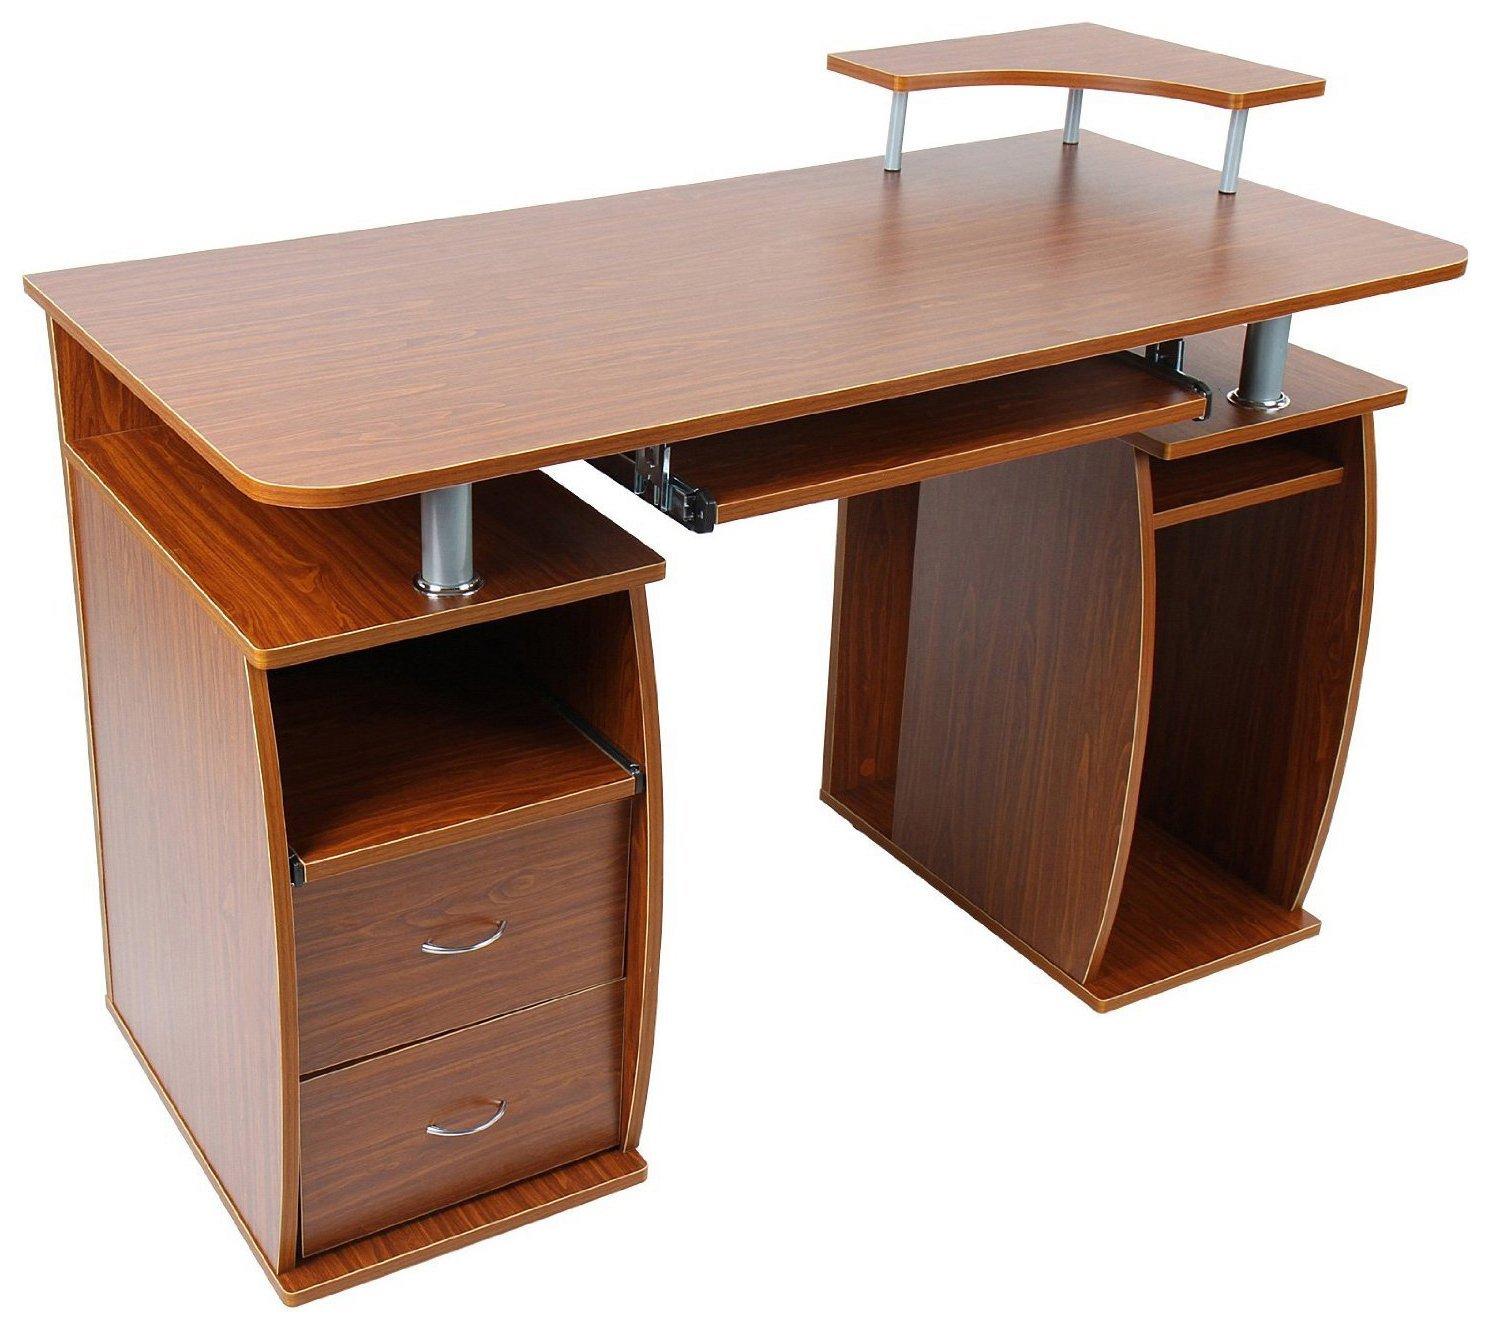 HomCom Home Office Computer Desk with Elevated Shelf